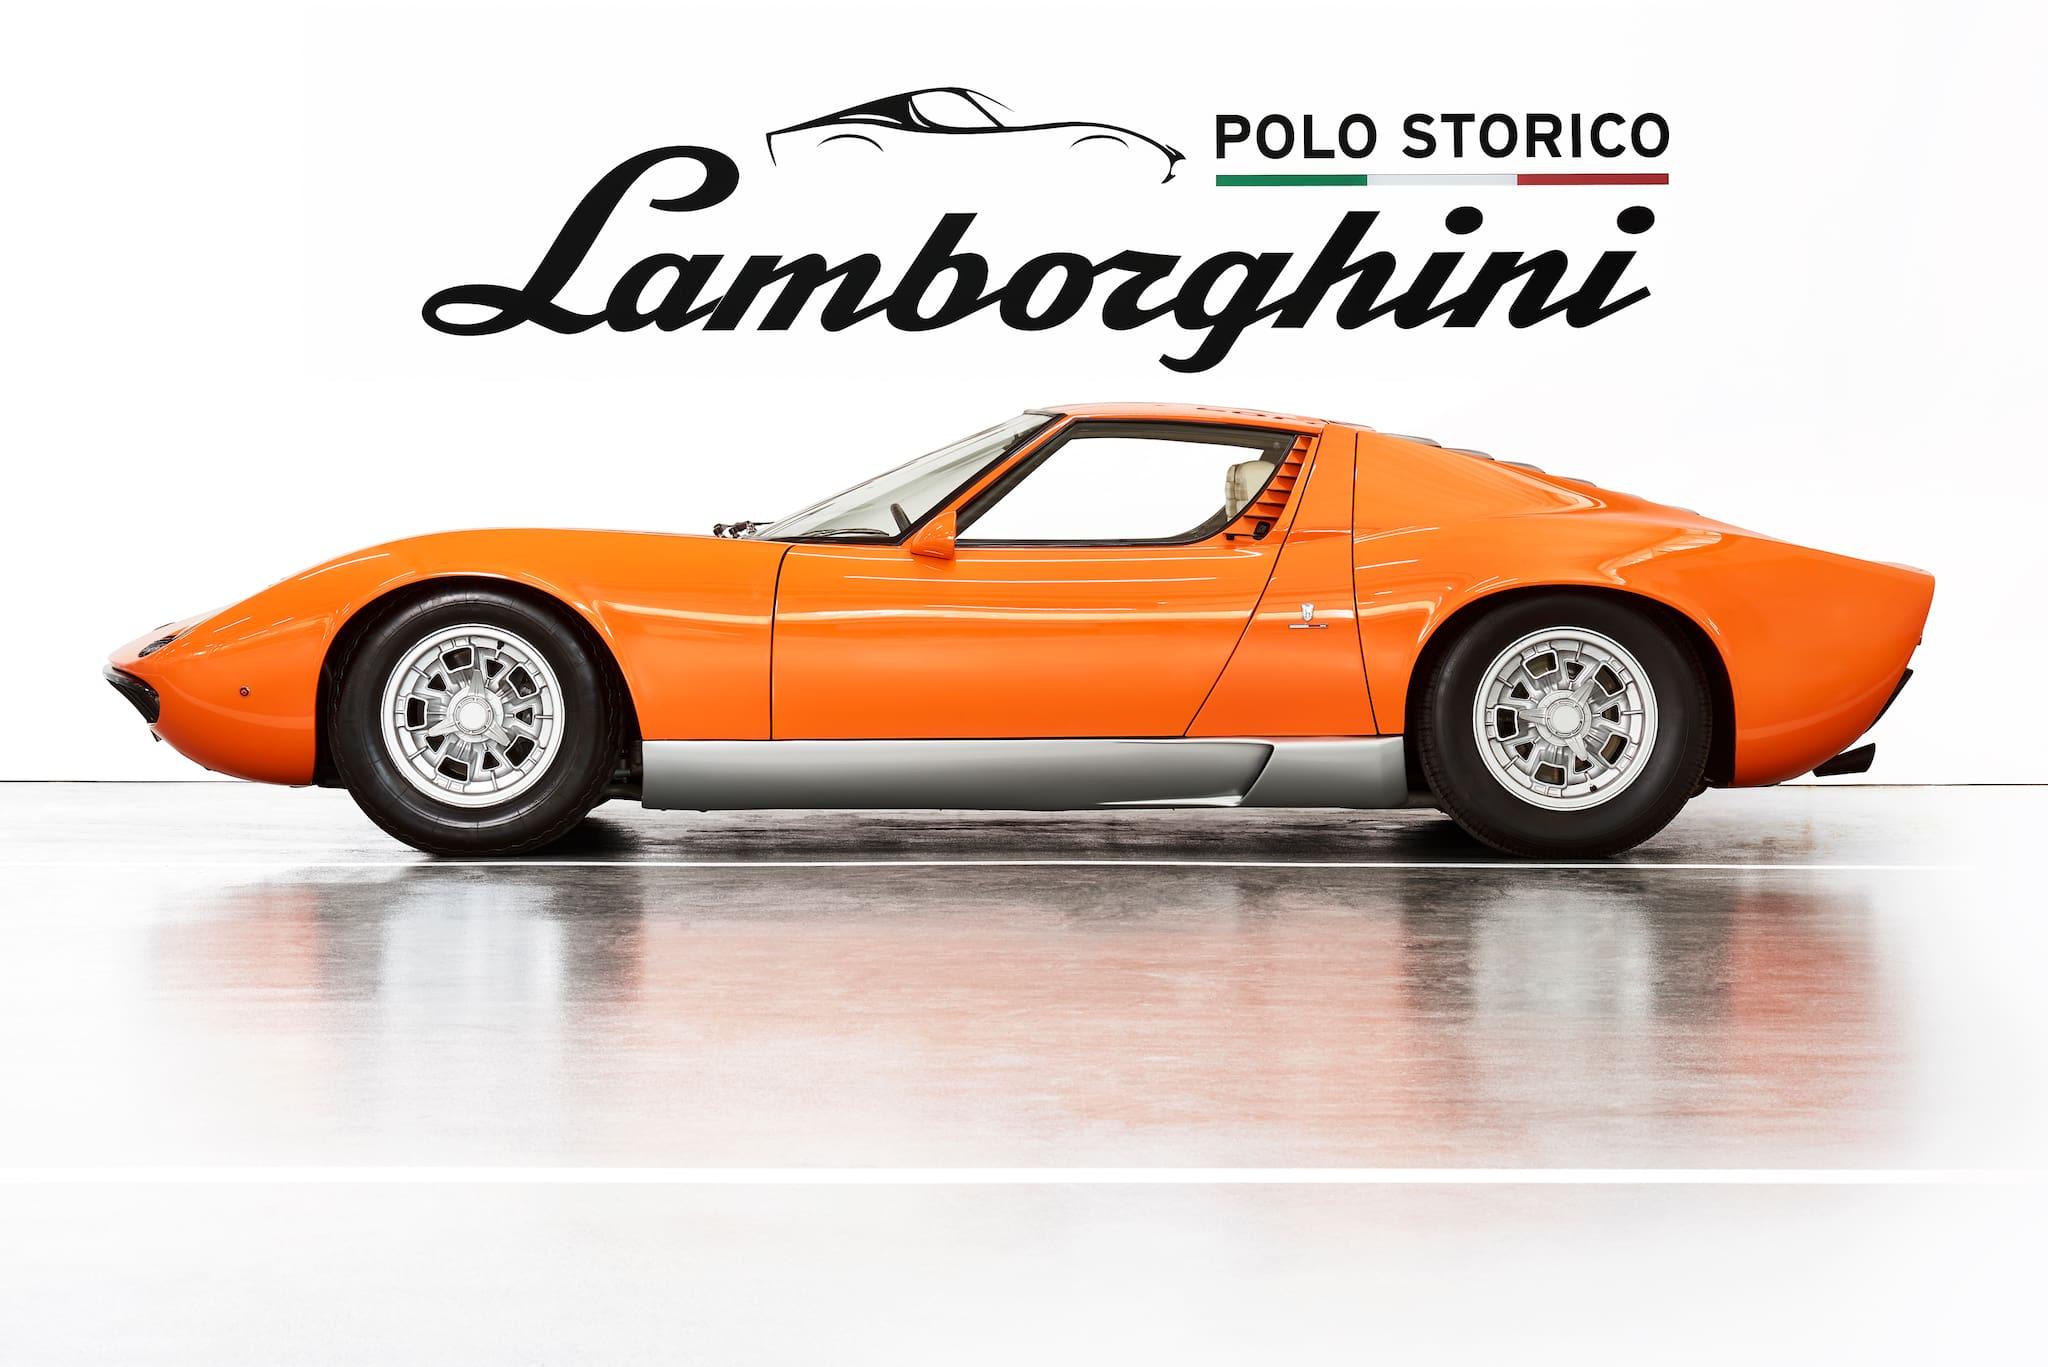 Lamborghini Polo Storico Discovers, Certifies Lamborghini Miura Used in 1969's 'The Italian Job'